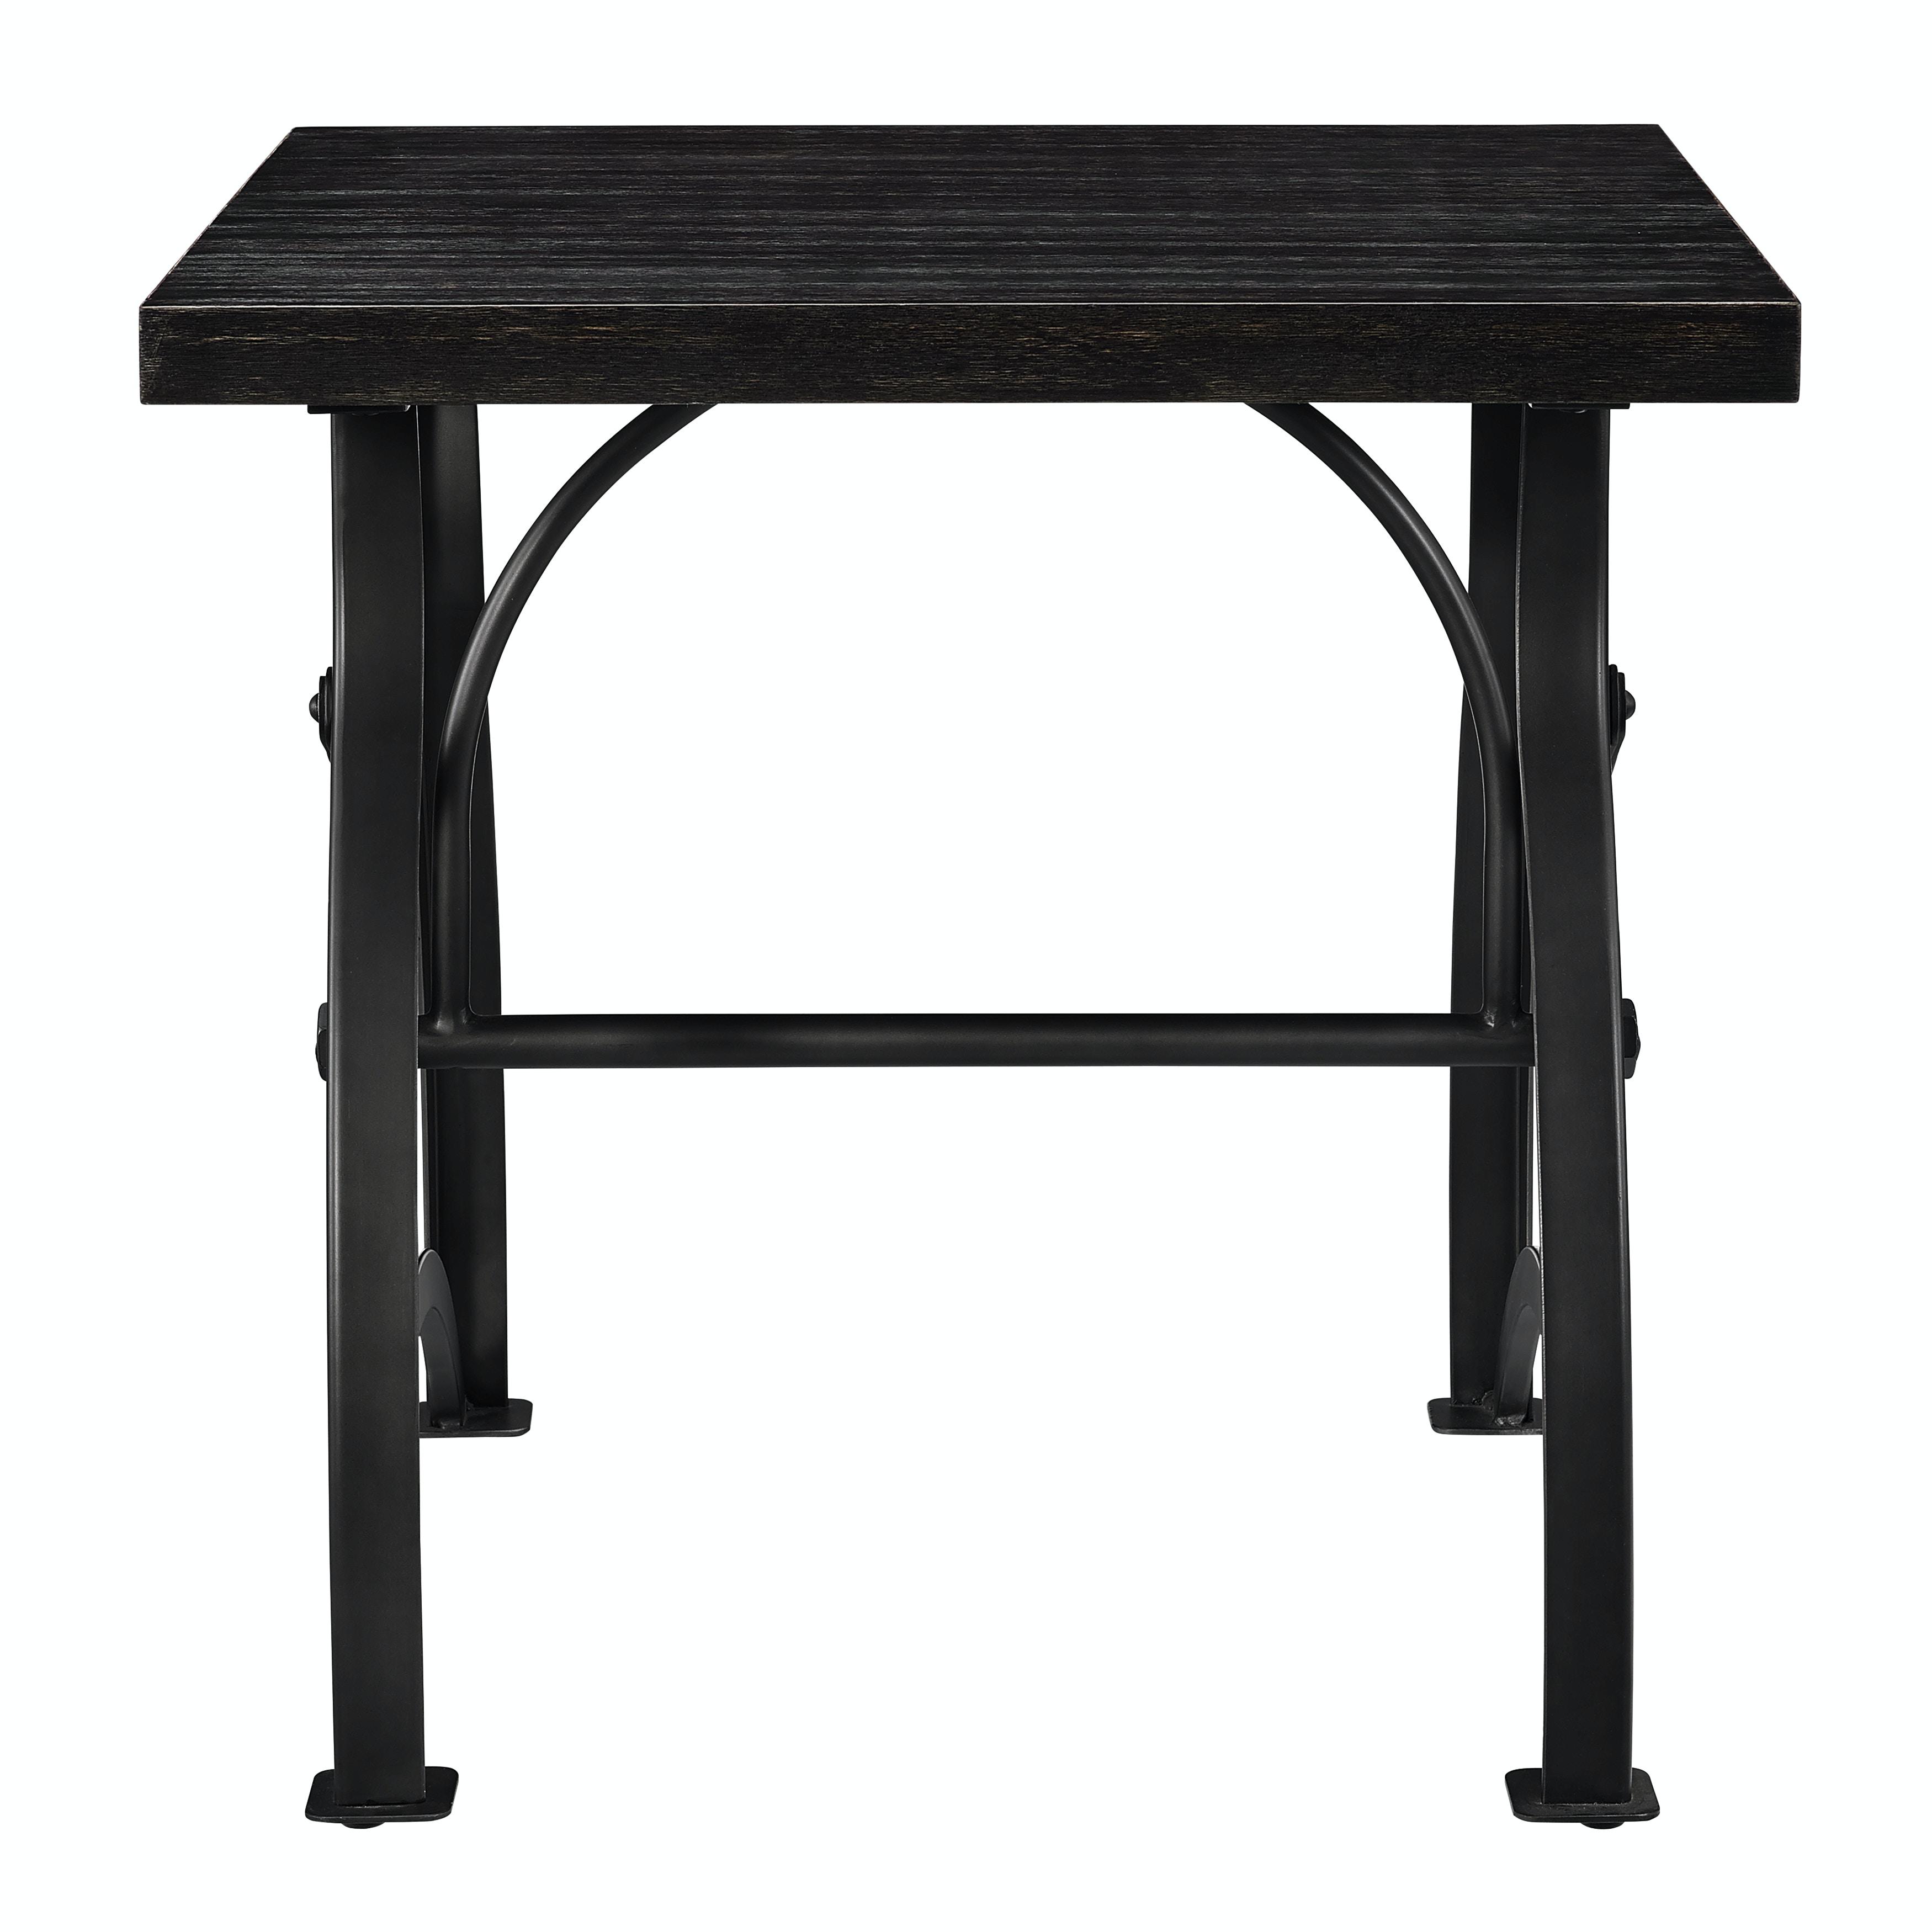 Pulaski Furniture Industrial Metal Brace End Table DS D080